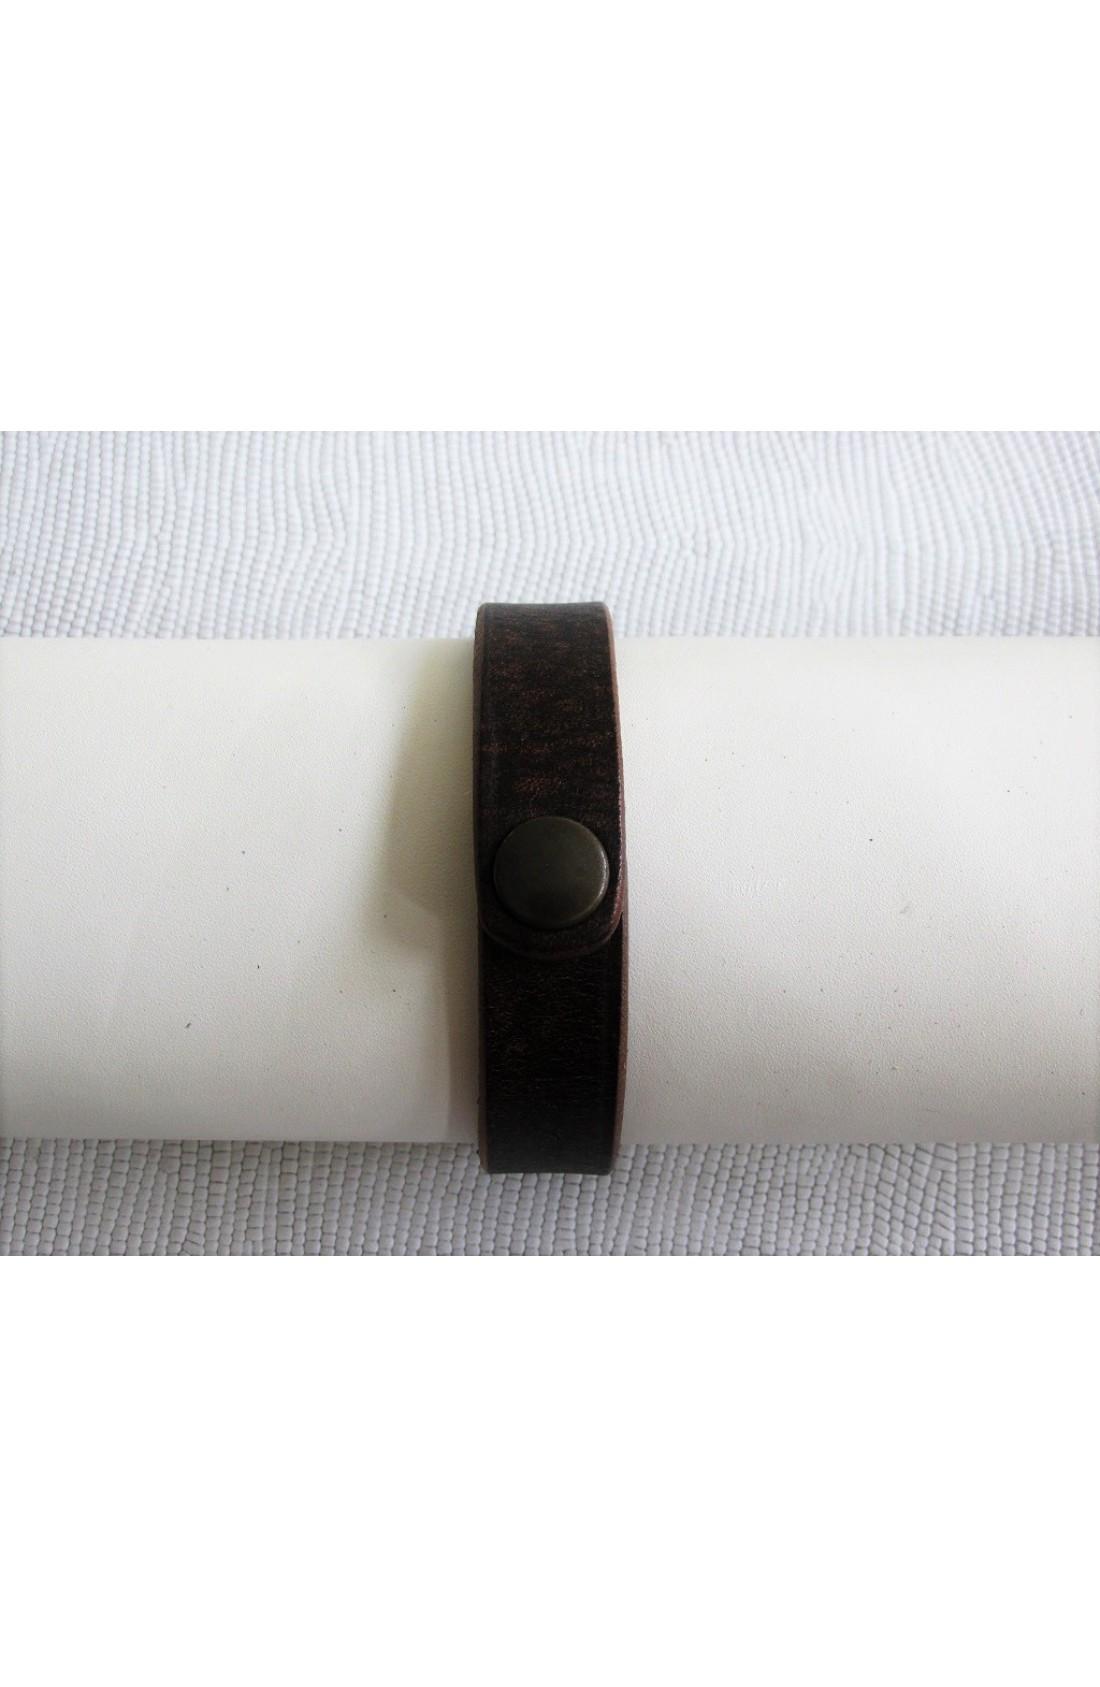 art. 10100 BRACCIALETTO mm.17 KANSAS CUOIO var.2 t.moro (2)